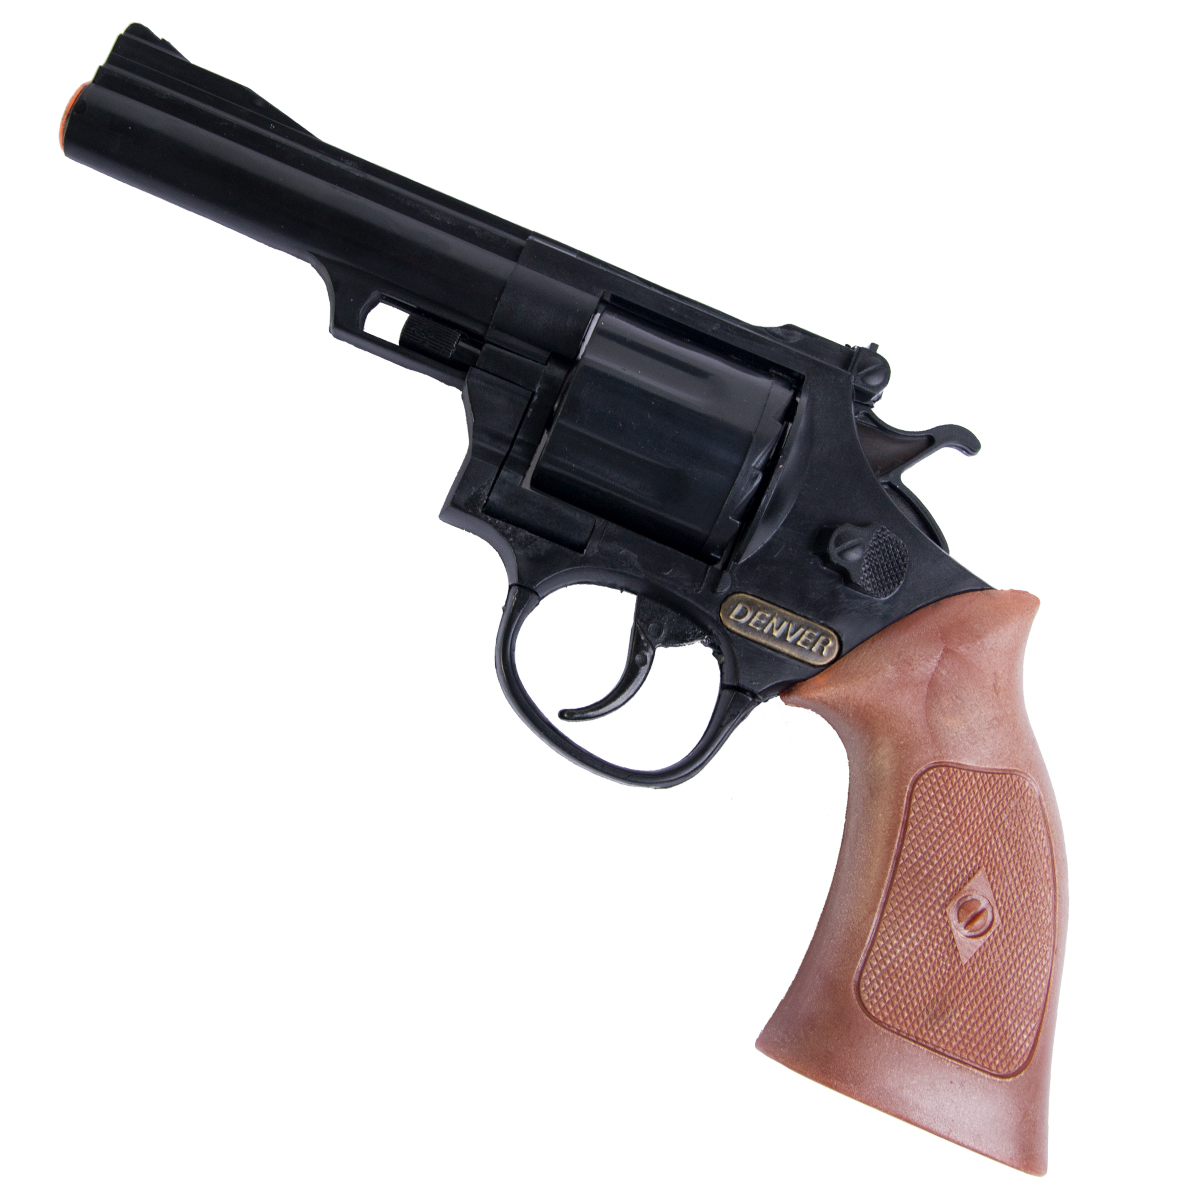 Western pistol Denver